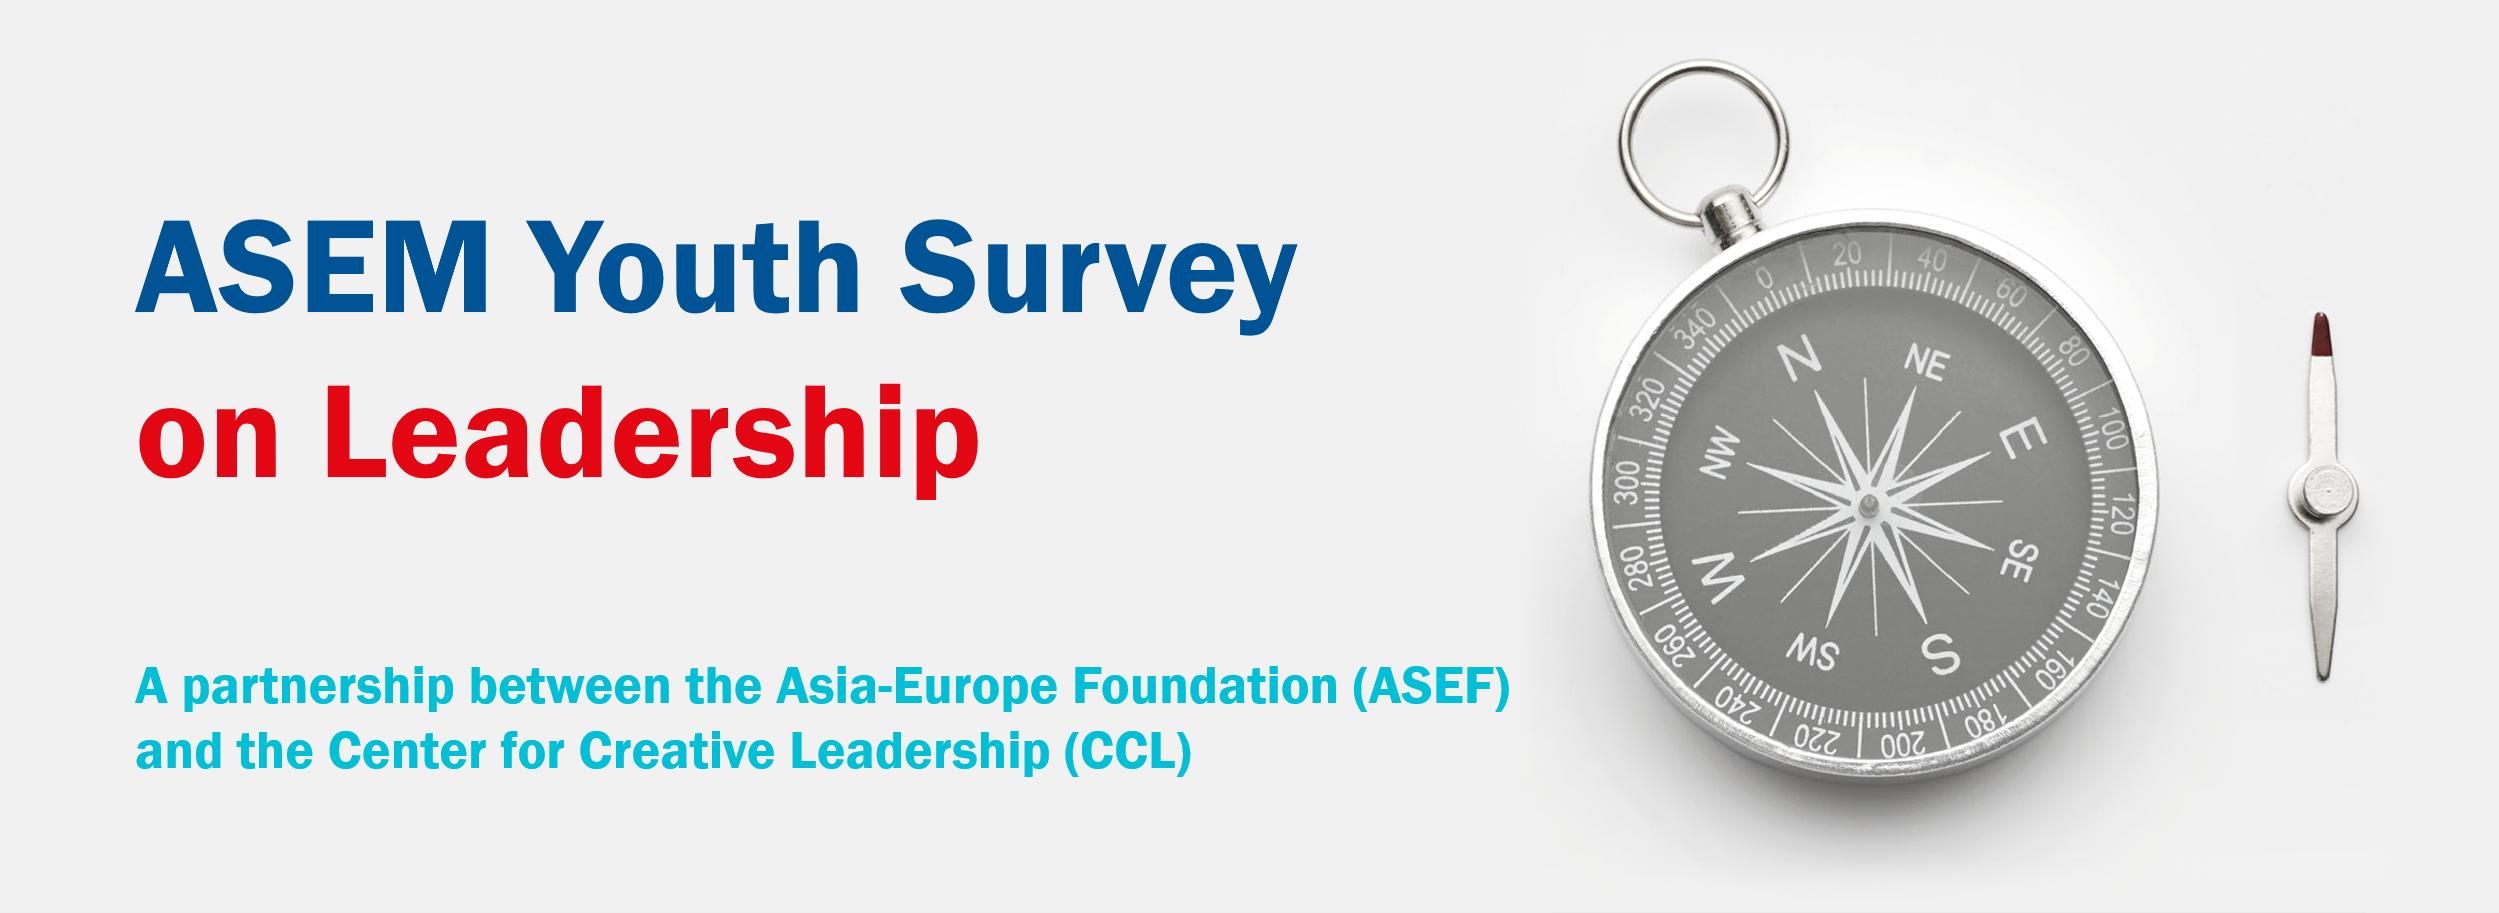 ASEM Youth Survey on Leadership Header Image